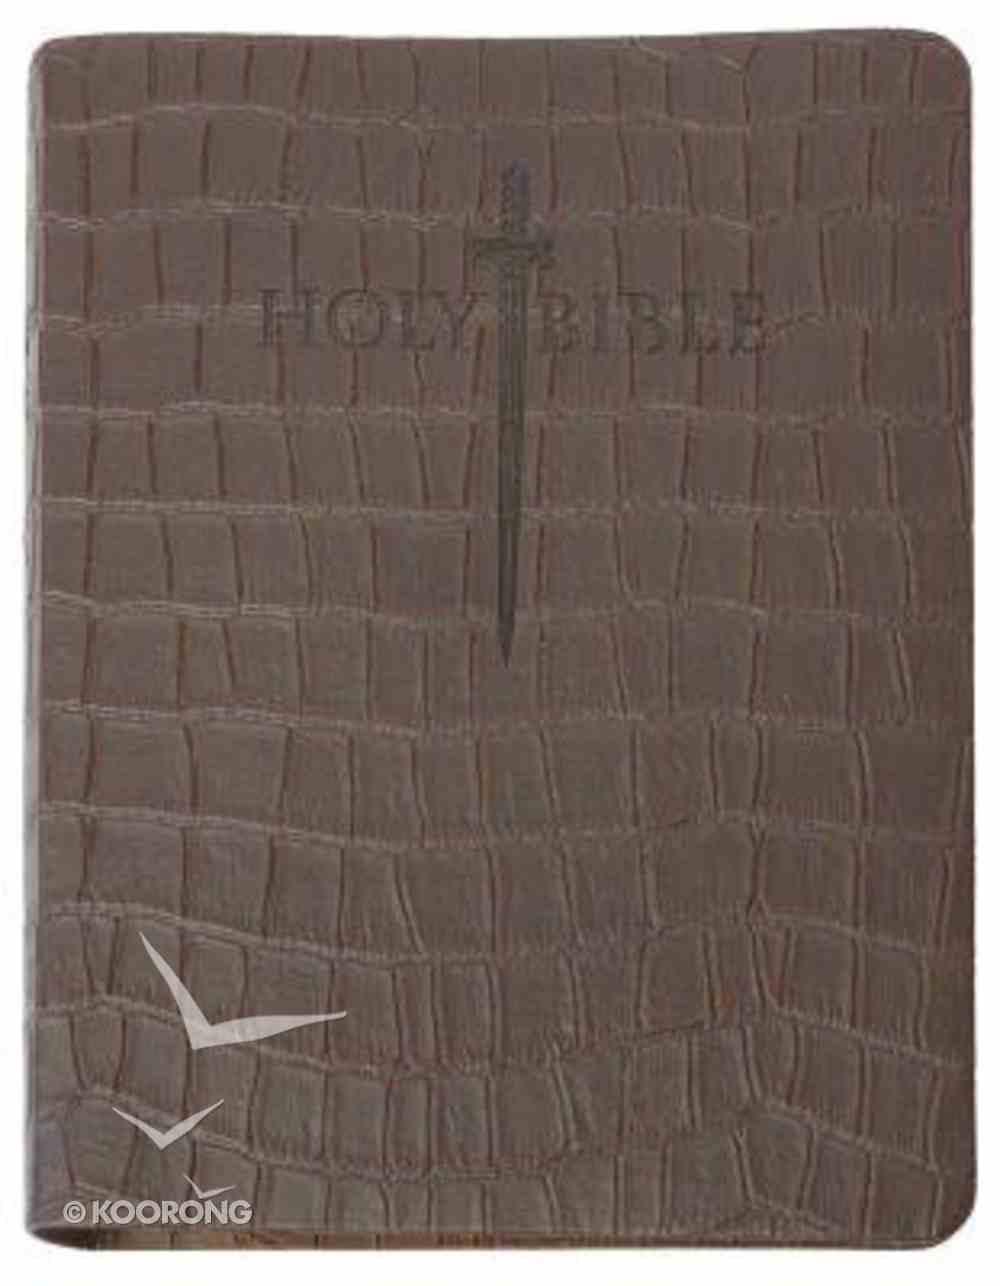 KJV Sword Study Bible Personal Size Large Print Brown T-Rex Ultrasoft Genuine Leather